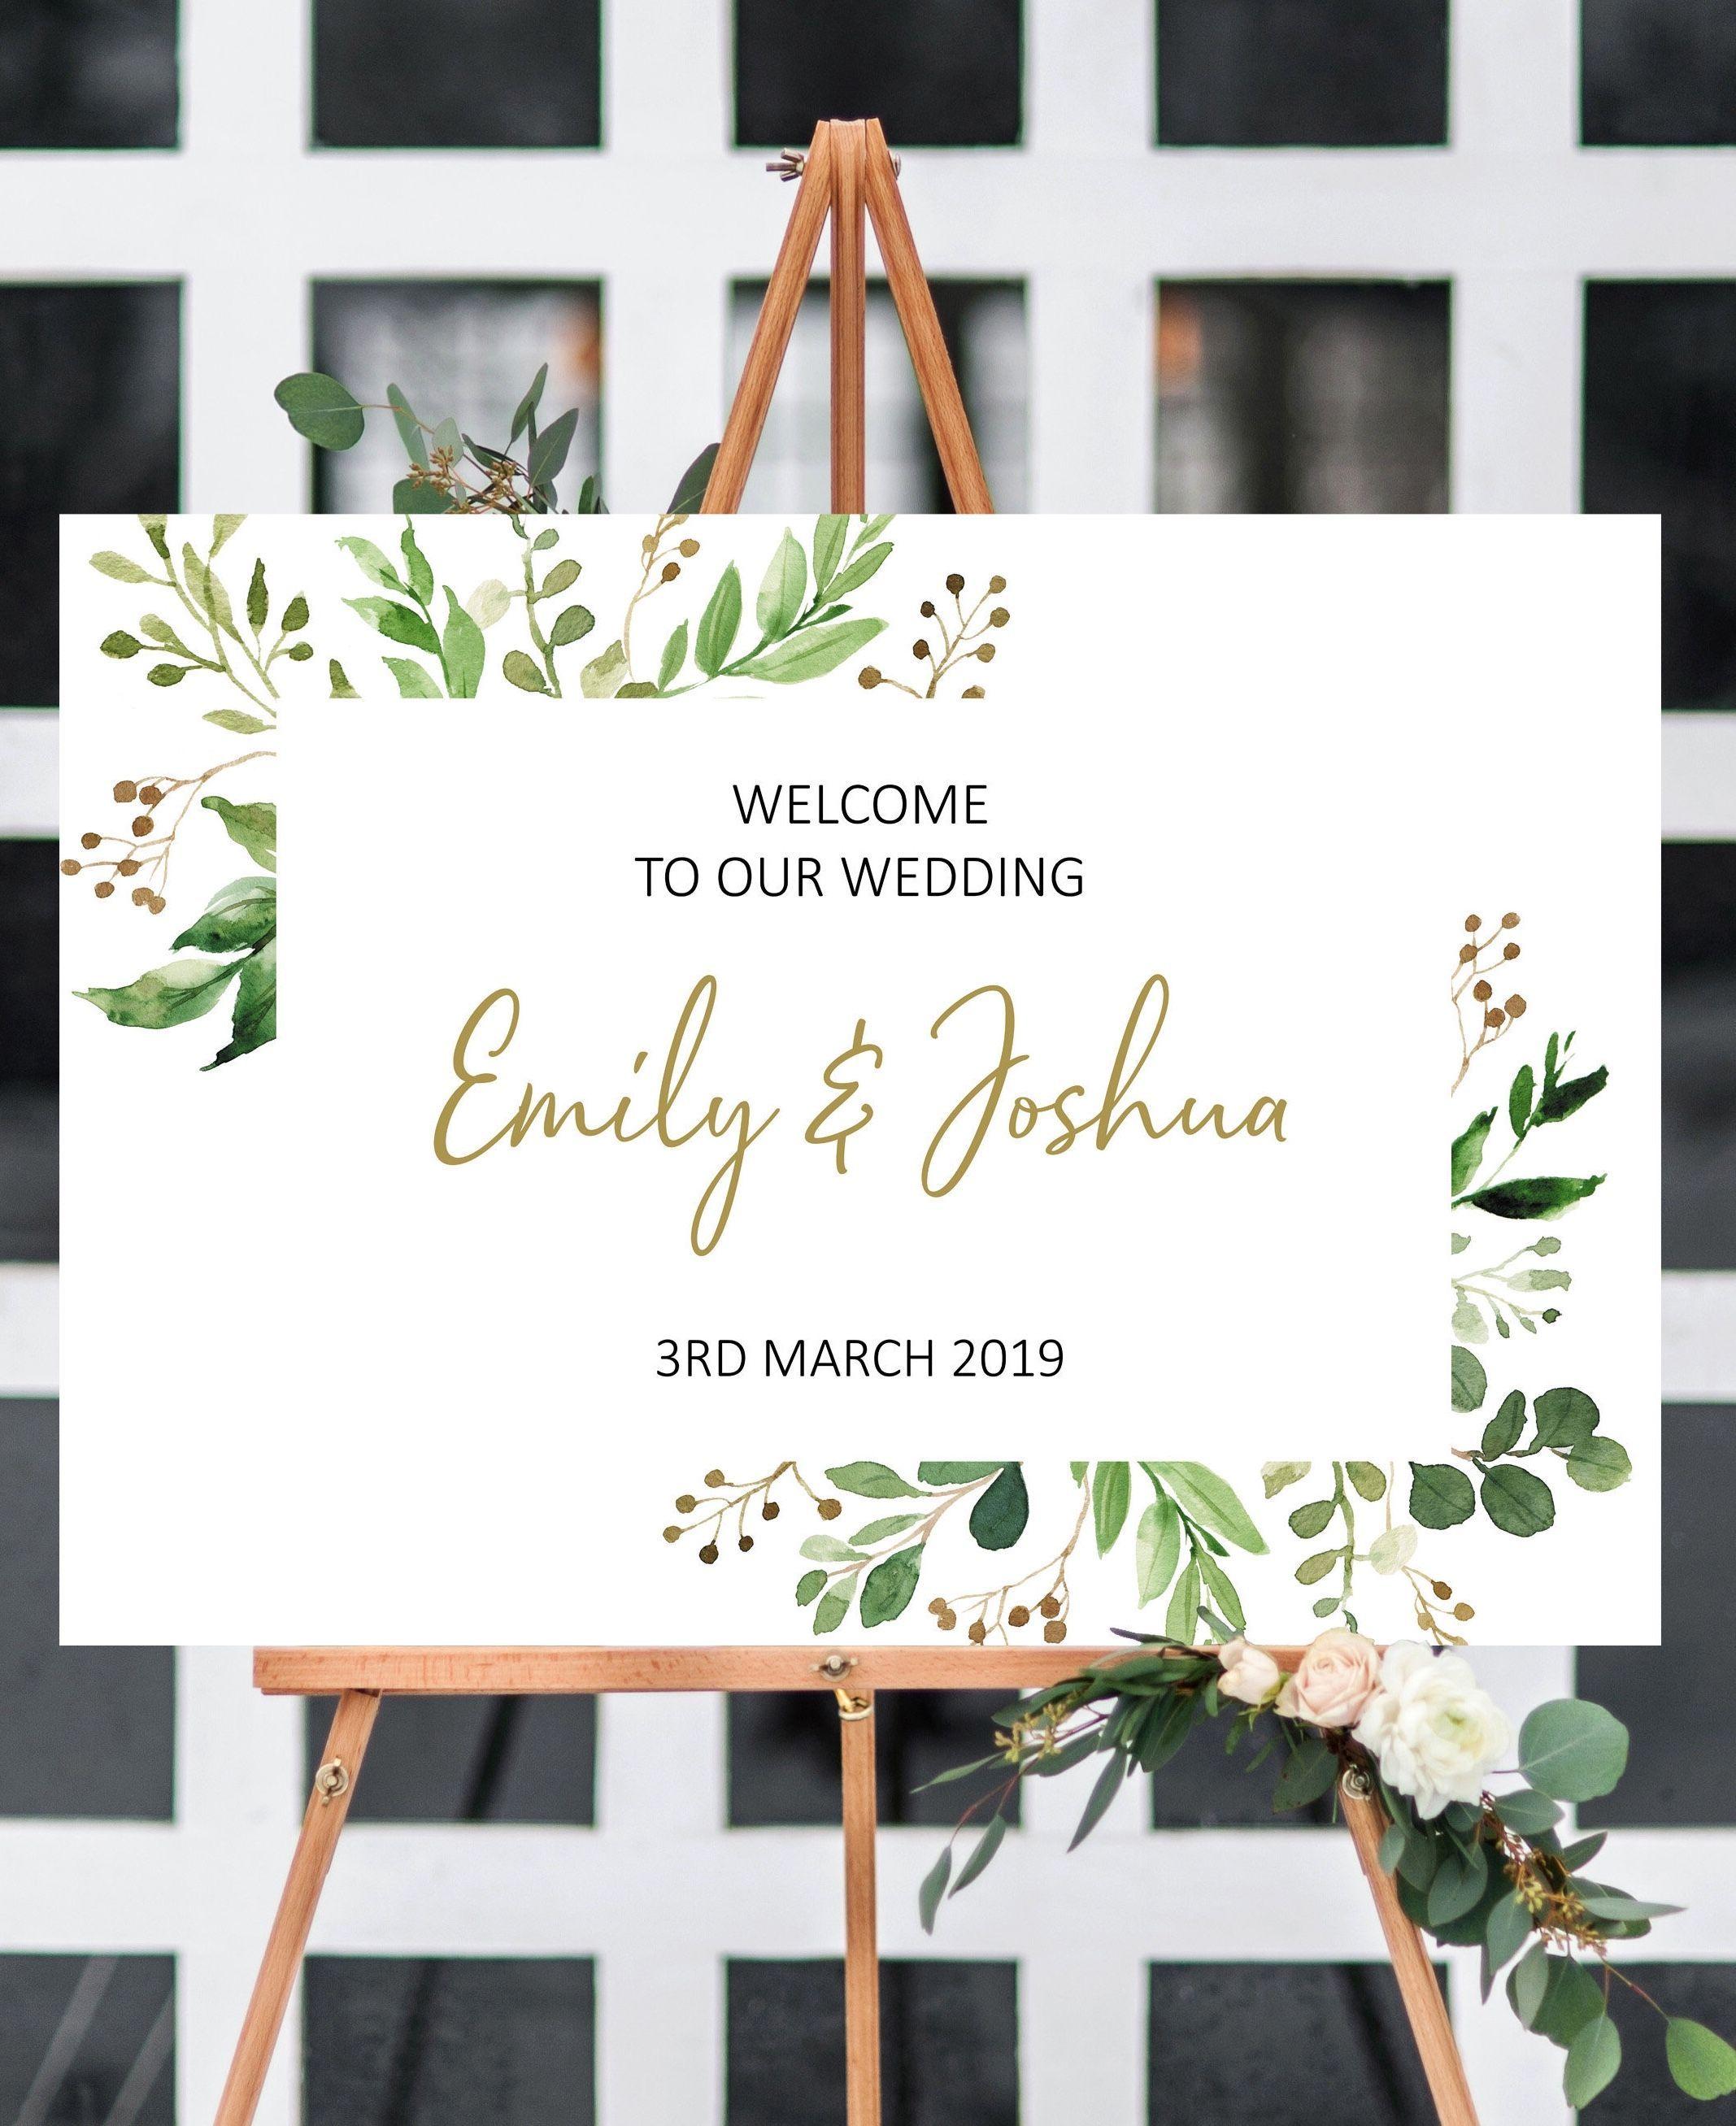 Wedding decorations gold and pink  Garden wedding welcome sign printable garden wedding ideas